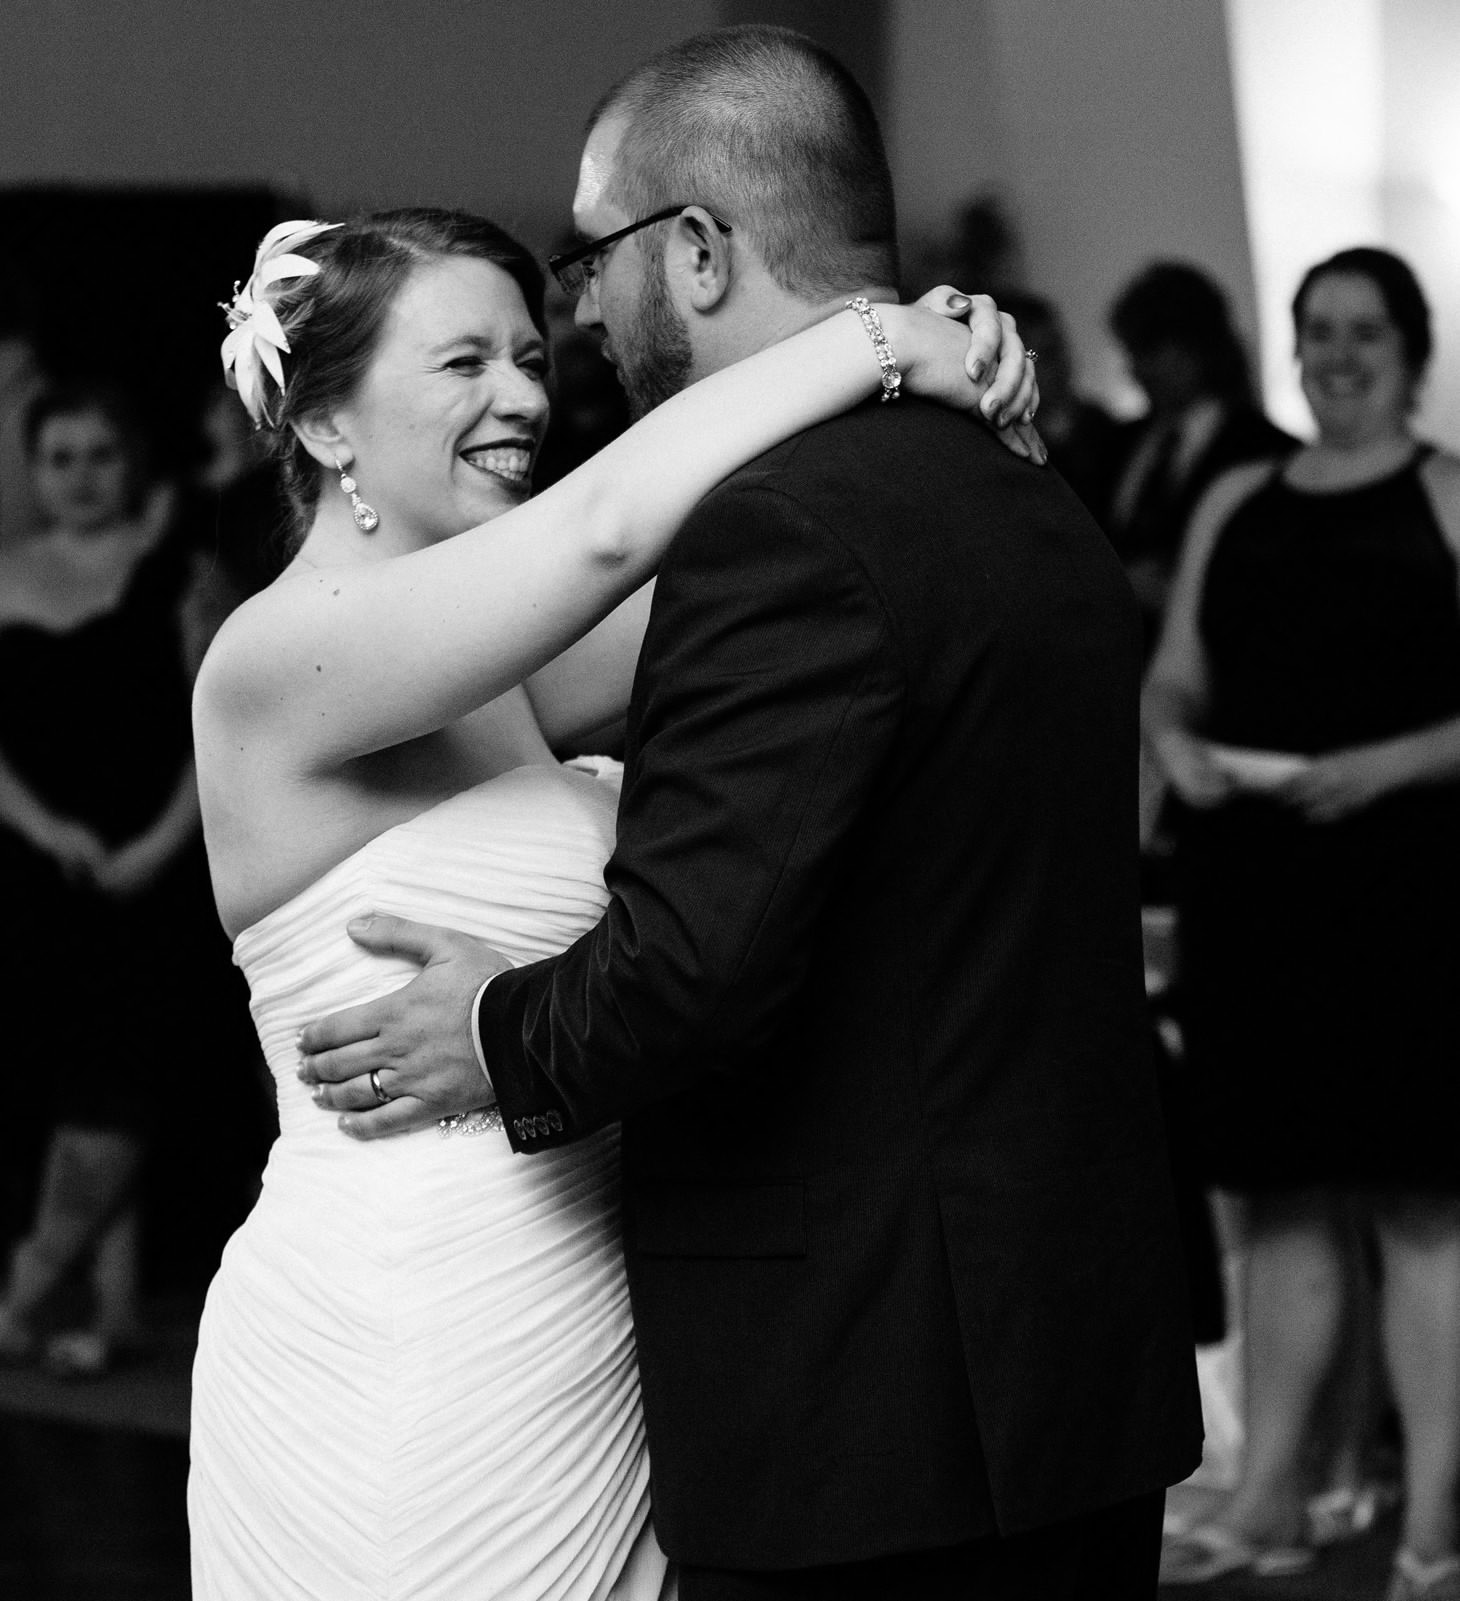 027-nyc-wedding-photographer-nj-nerdy-dr-who-firehouse-wedding-smitten-chickens.jpg